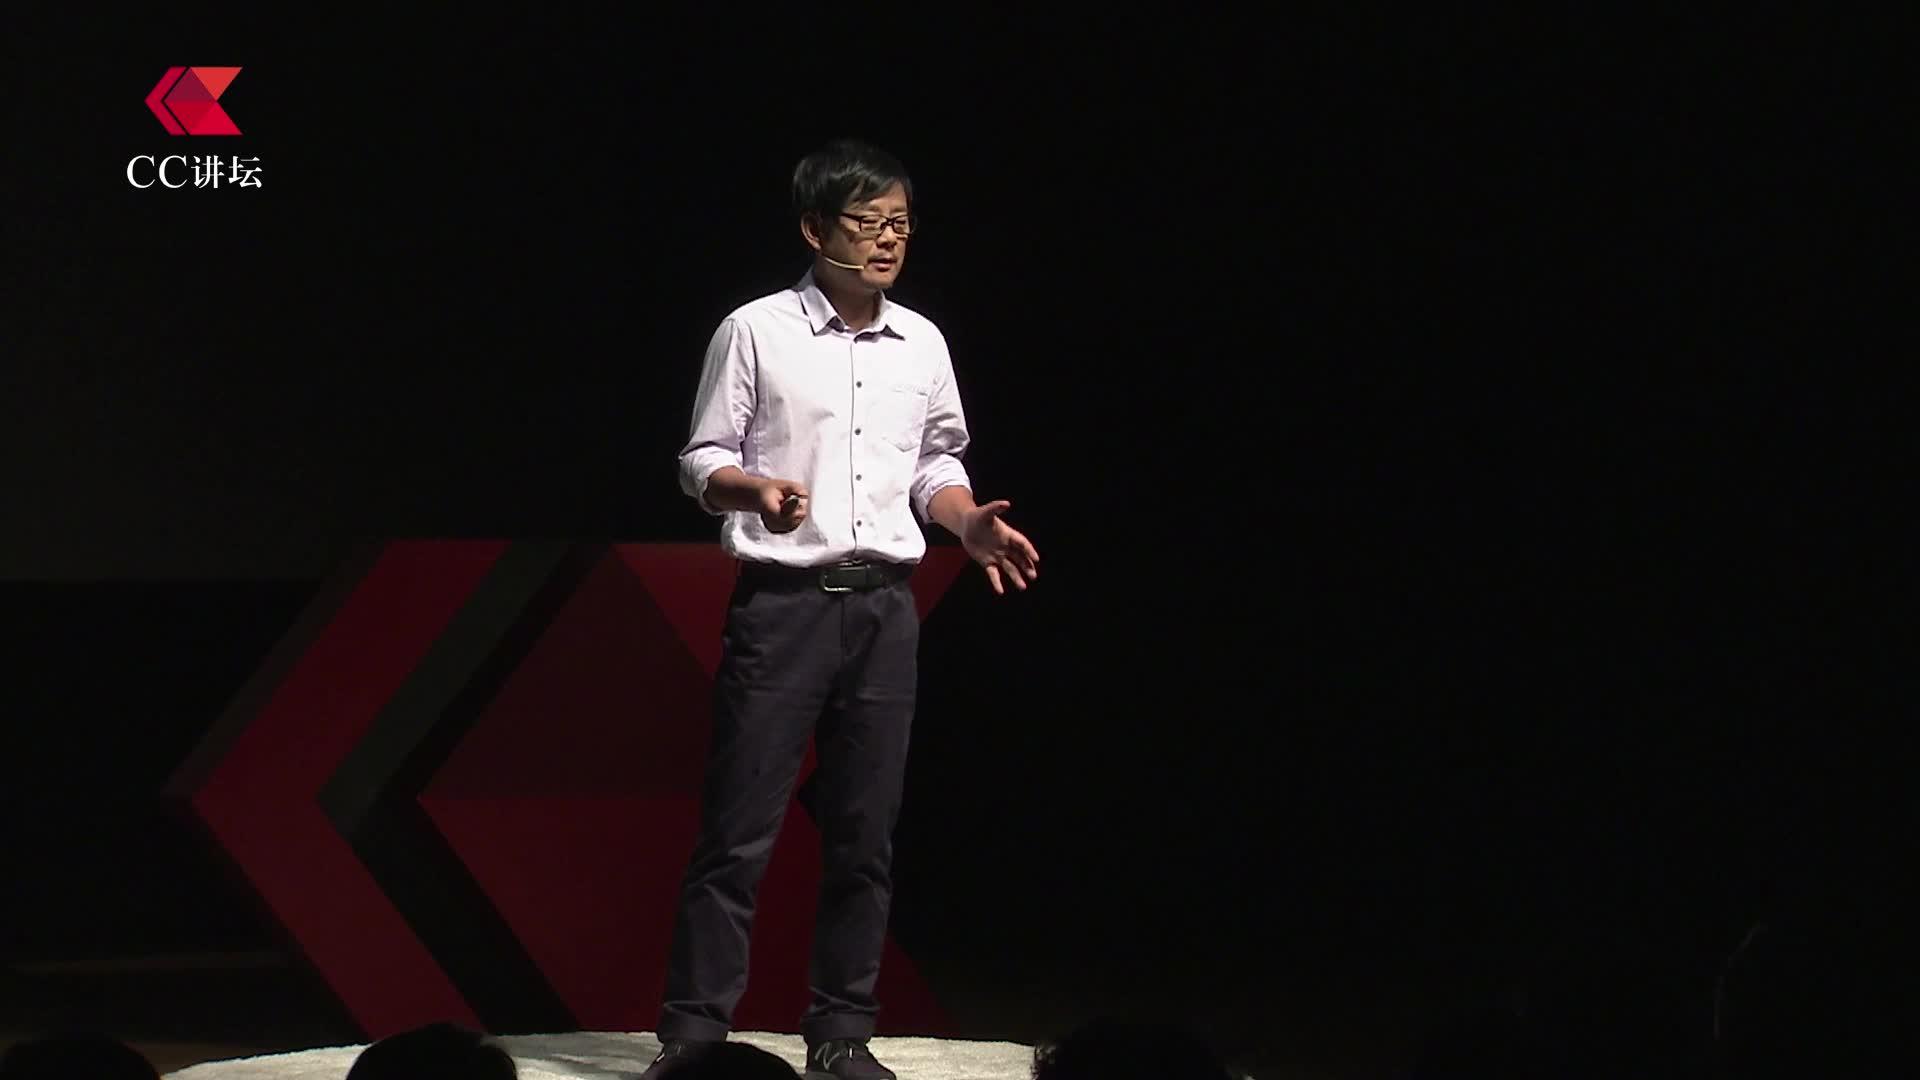 CC讲坛——李子青:解密刷脸与生物特征识别